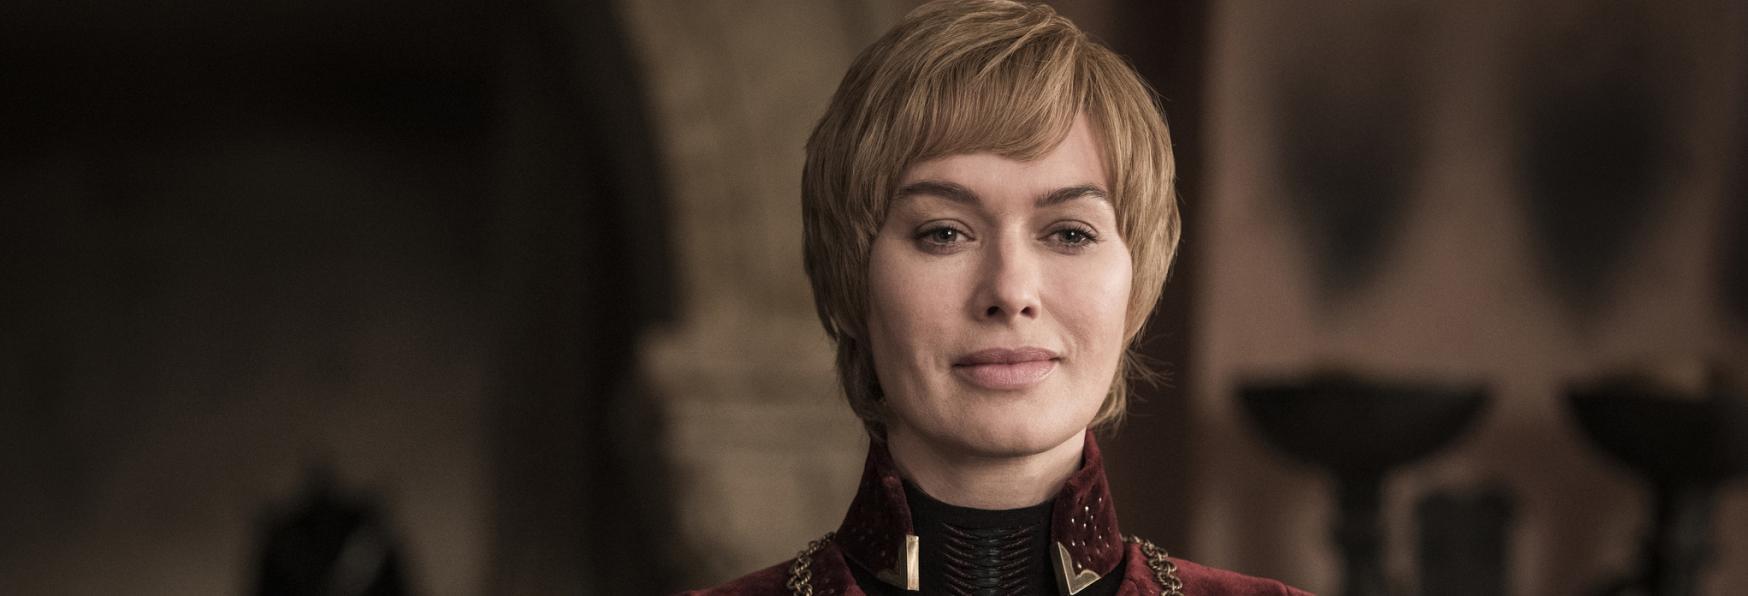 White House Plumbers: Lena Headey (Game of Thrones) nel Cast della Serie TV HBO su Watergate